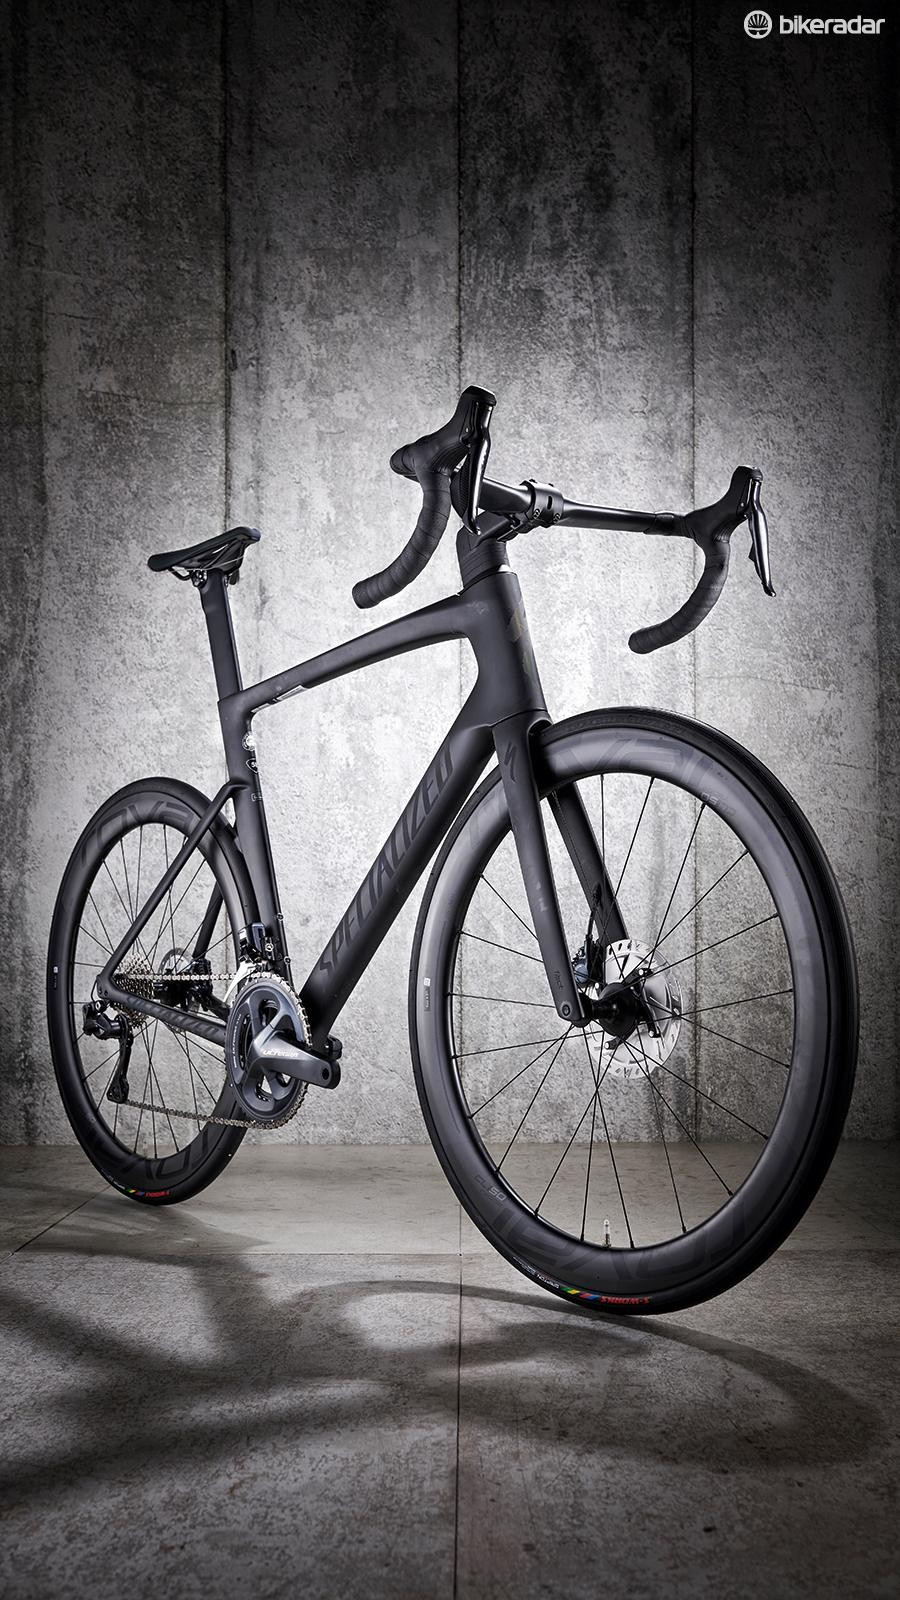 Specialized Venge Pro review - BikeRadar